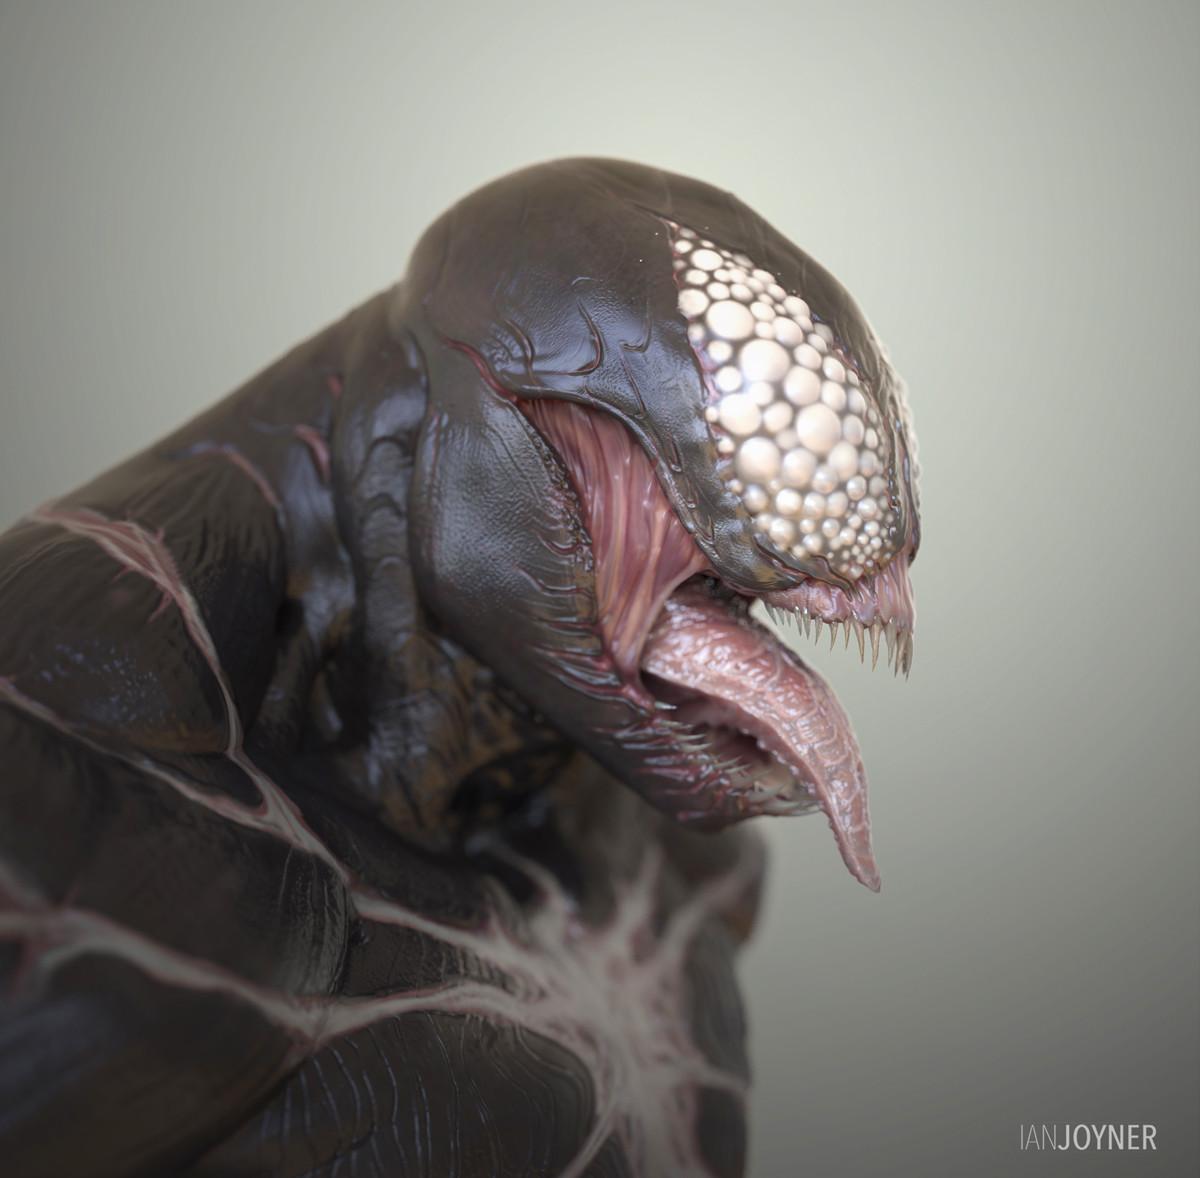 Venom Fan Art - *Ongoing Updates*